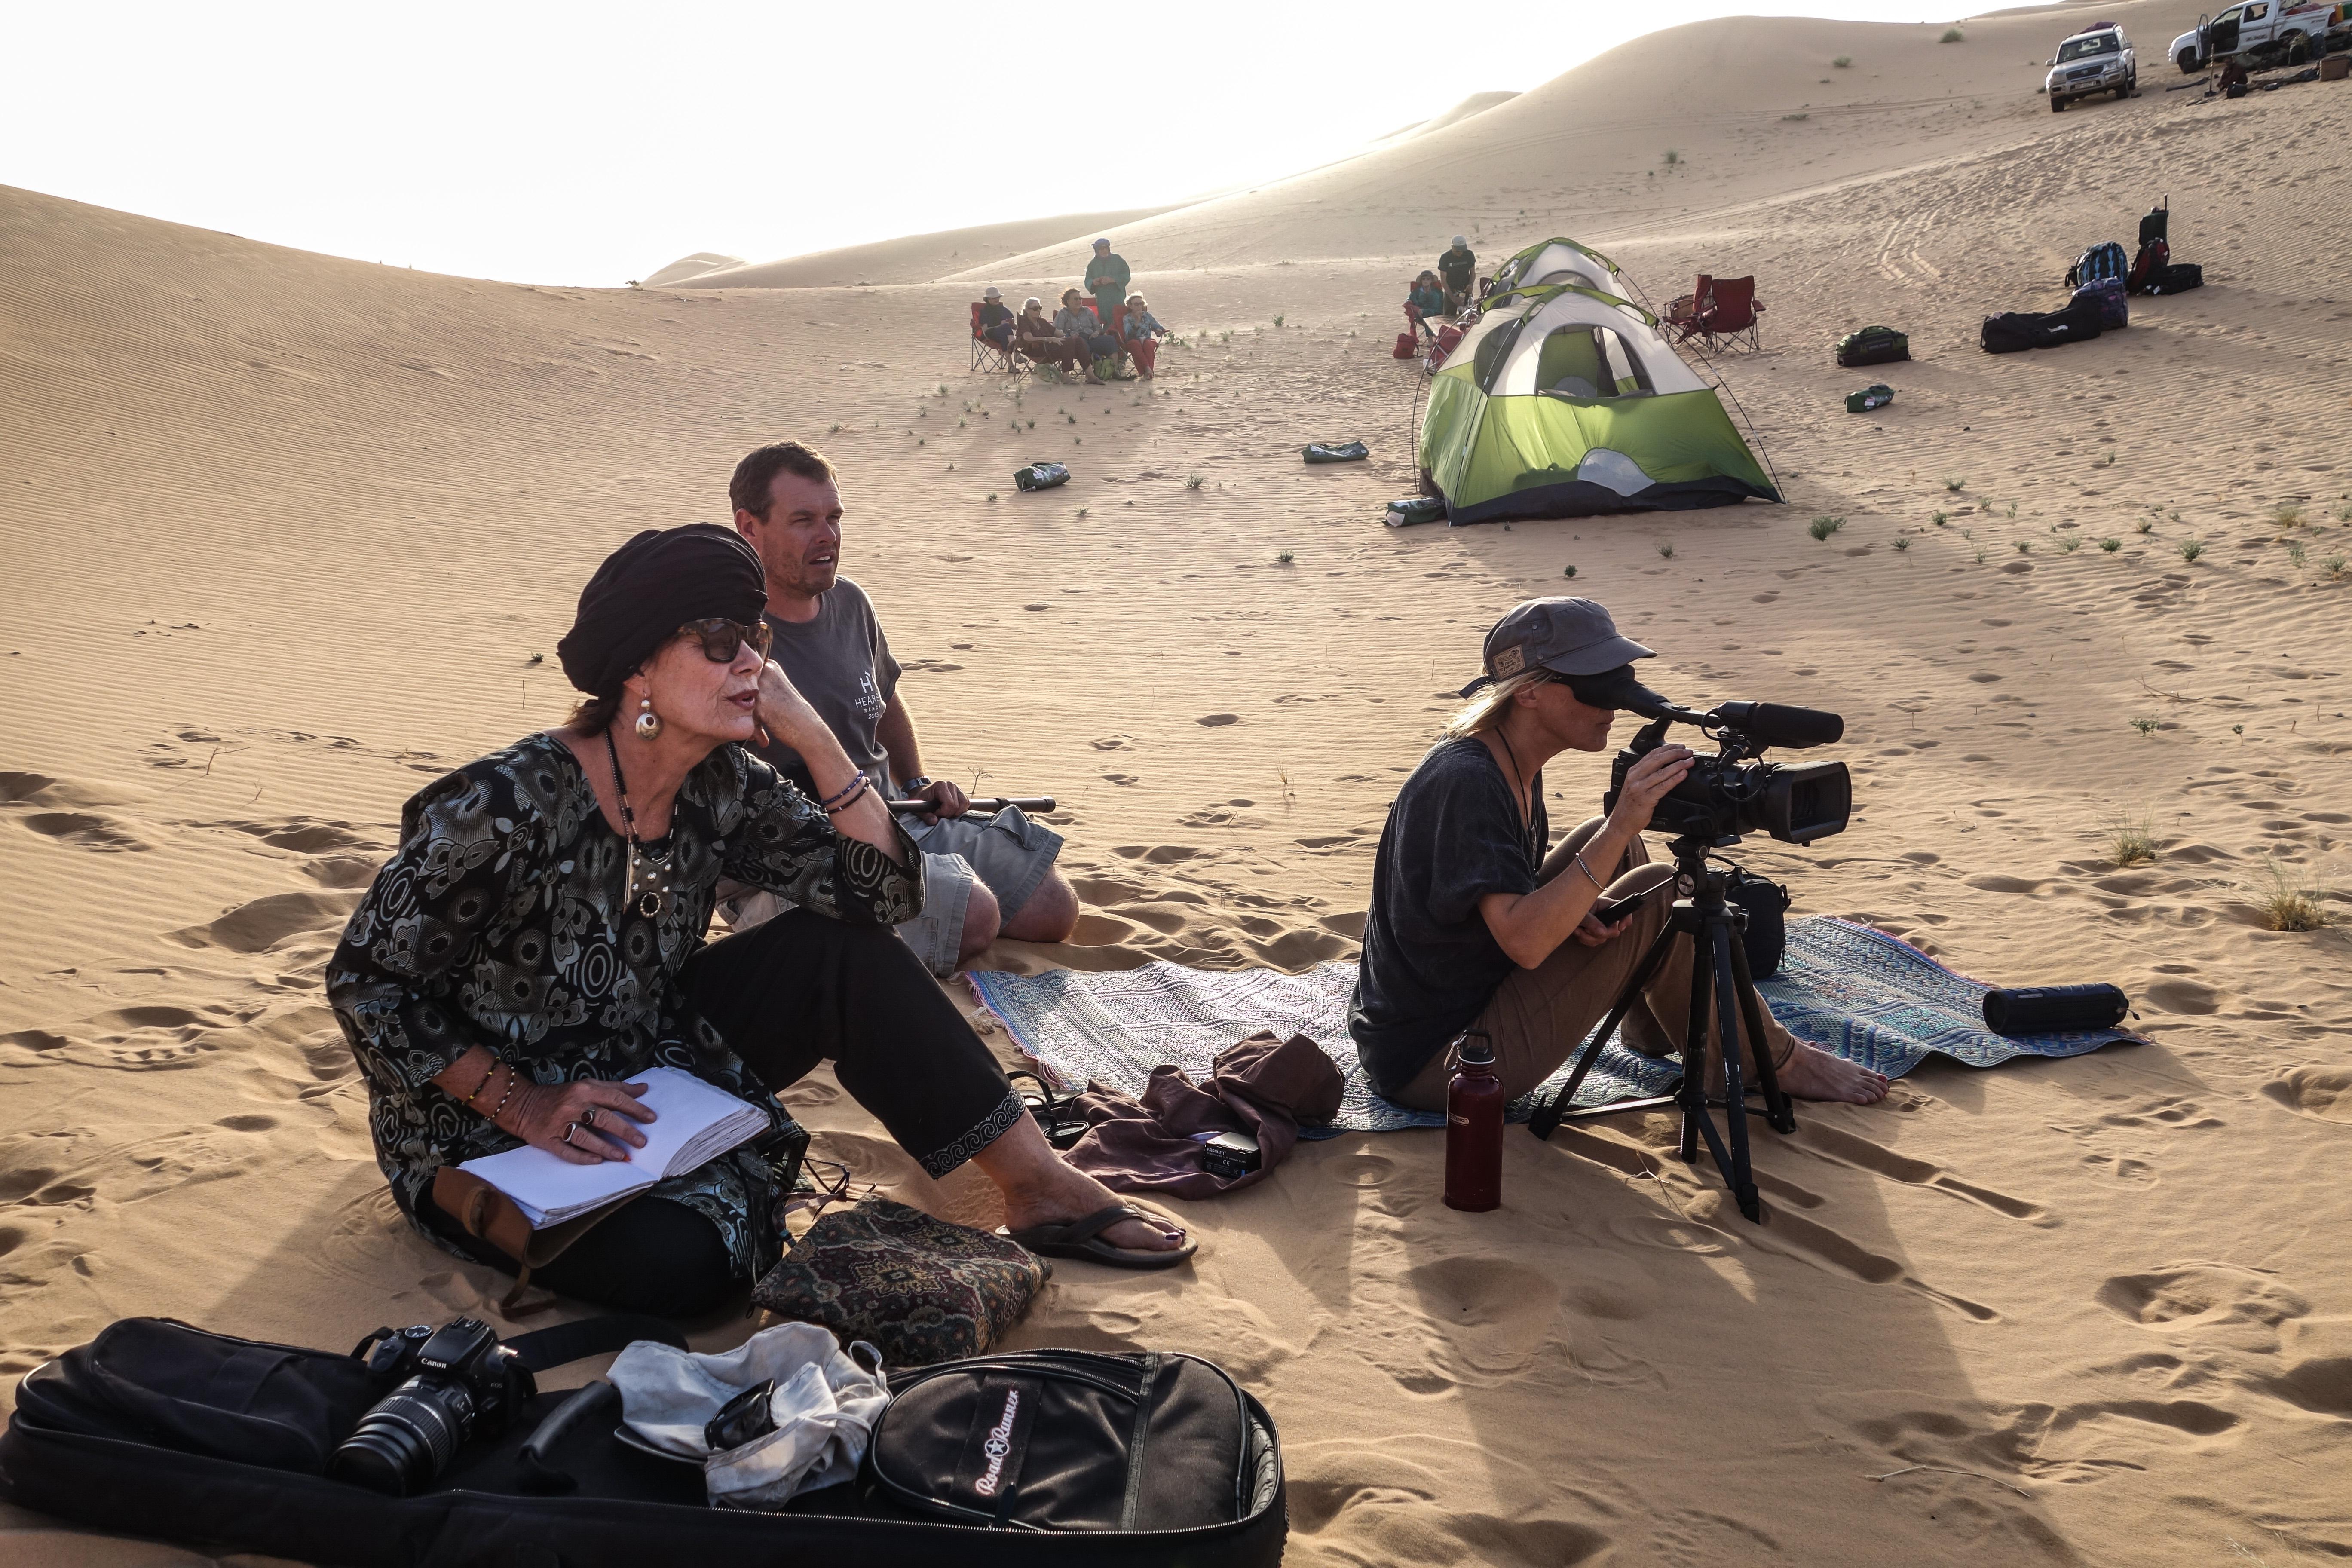 Filming in Niger